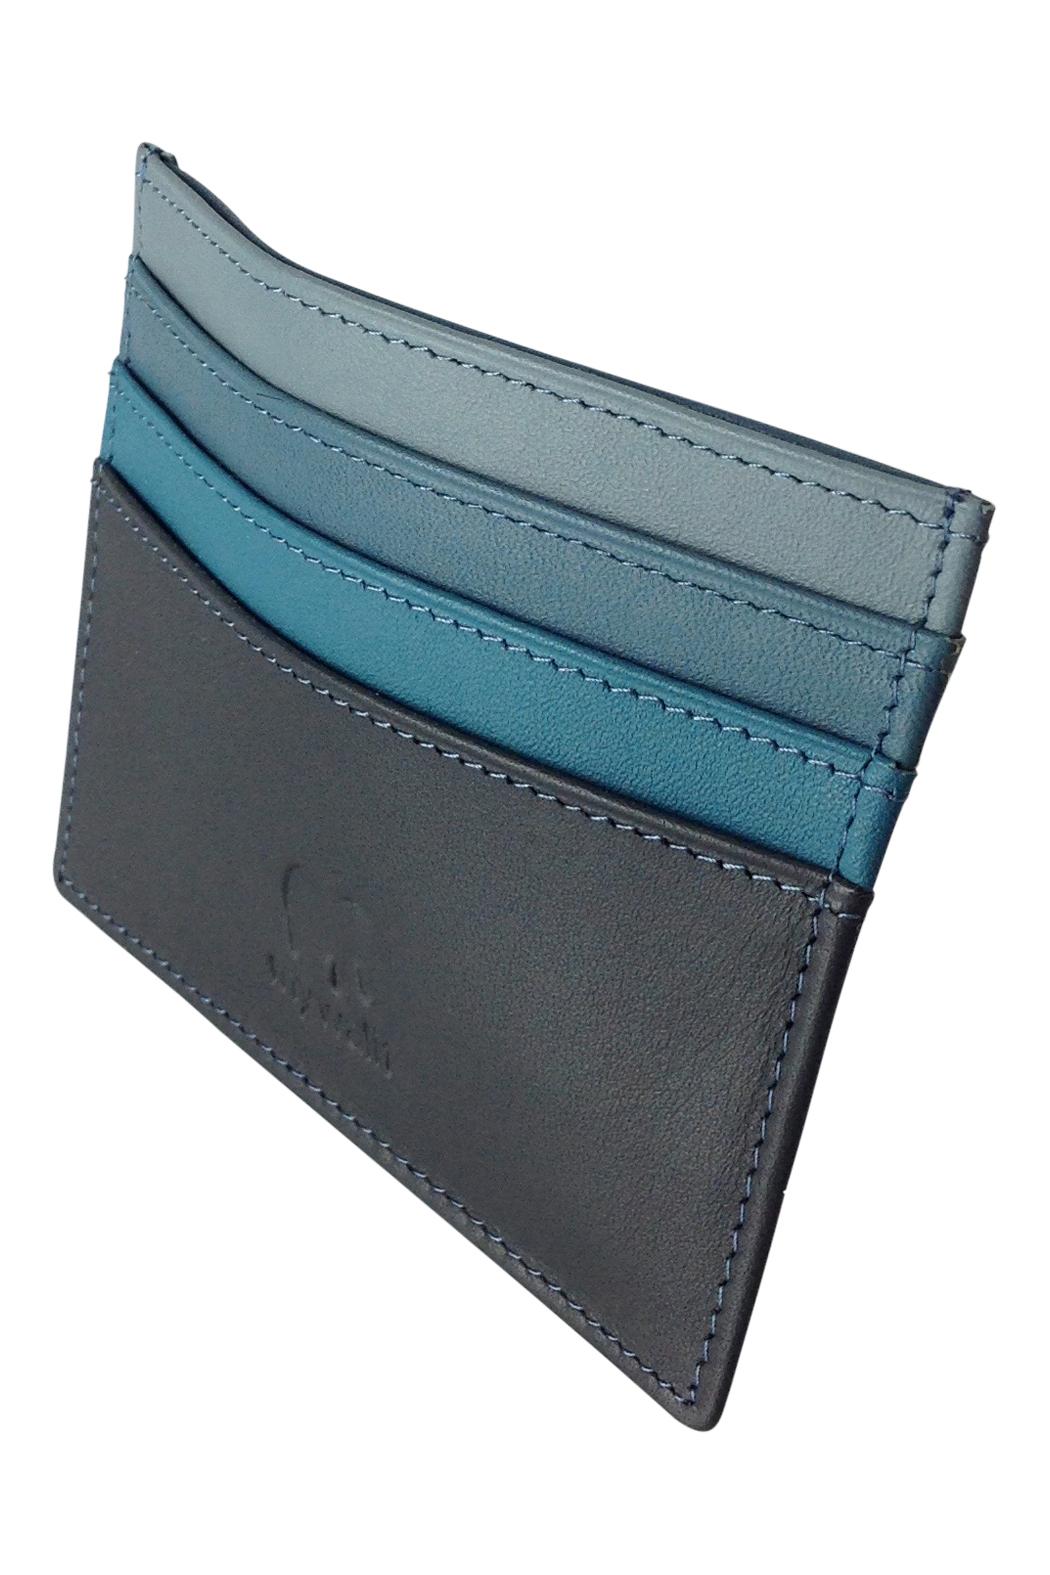 GH191. Ocean mini wallet